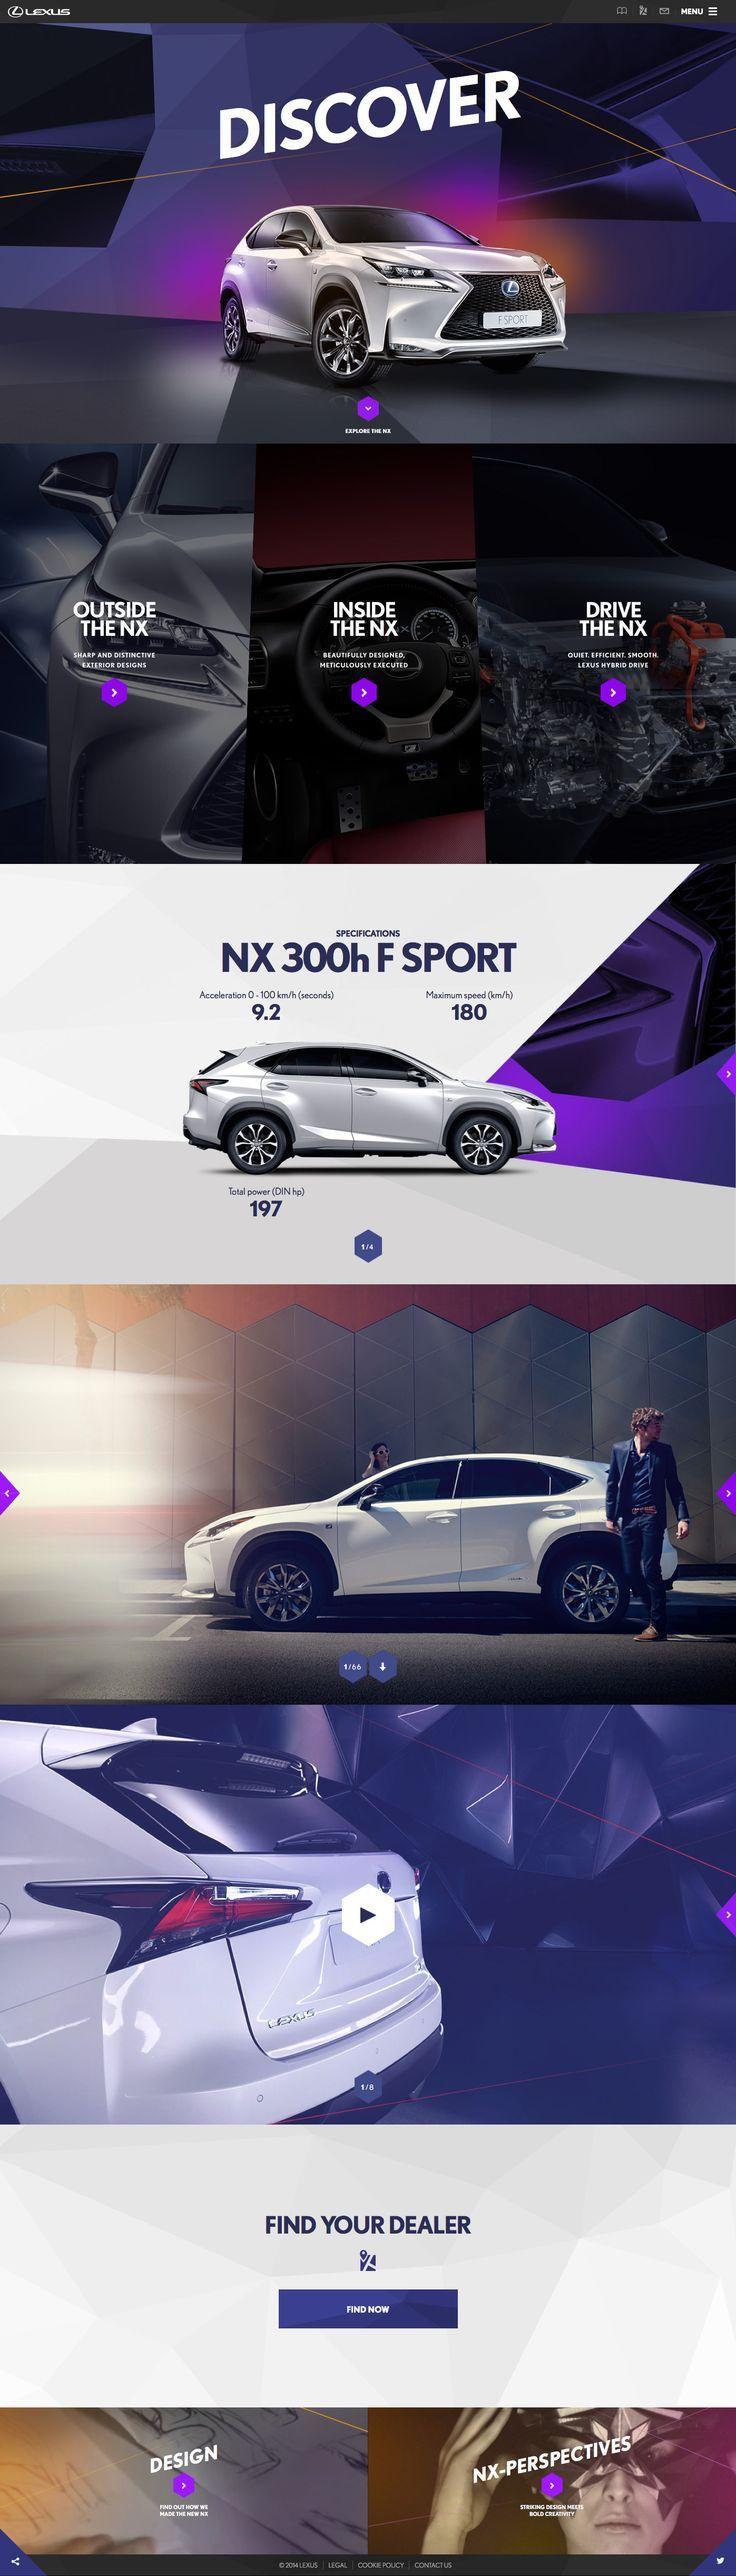 Unique Web Design, Lexus NX (http://www.lexus.eu/car-models/nx/nx-house/index.tmex#/discover/hero) #WebDesign #Design (http://www.pinterest.com/aldenchong/)